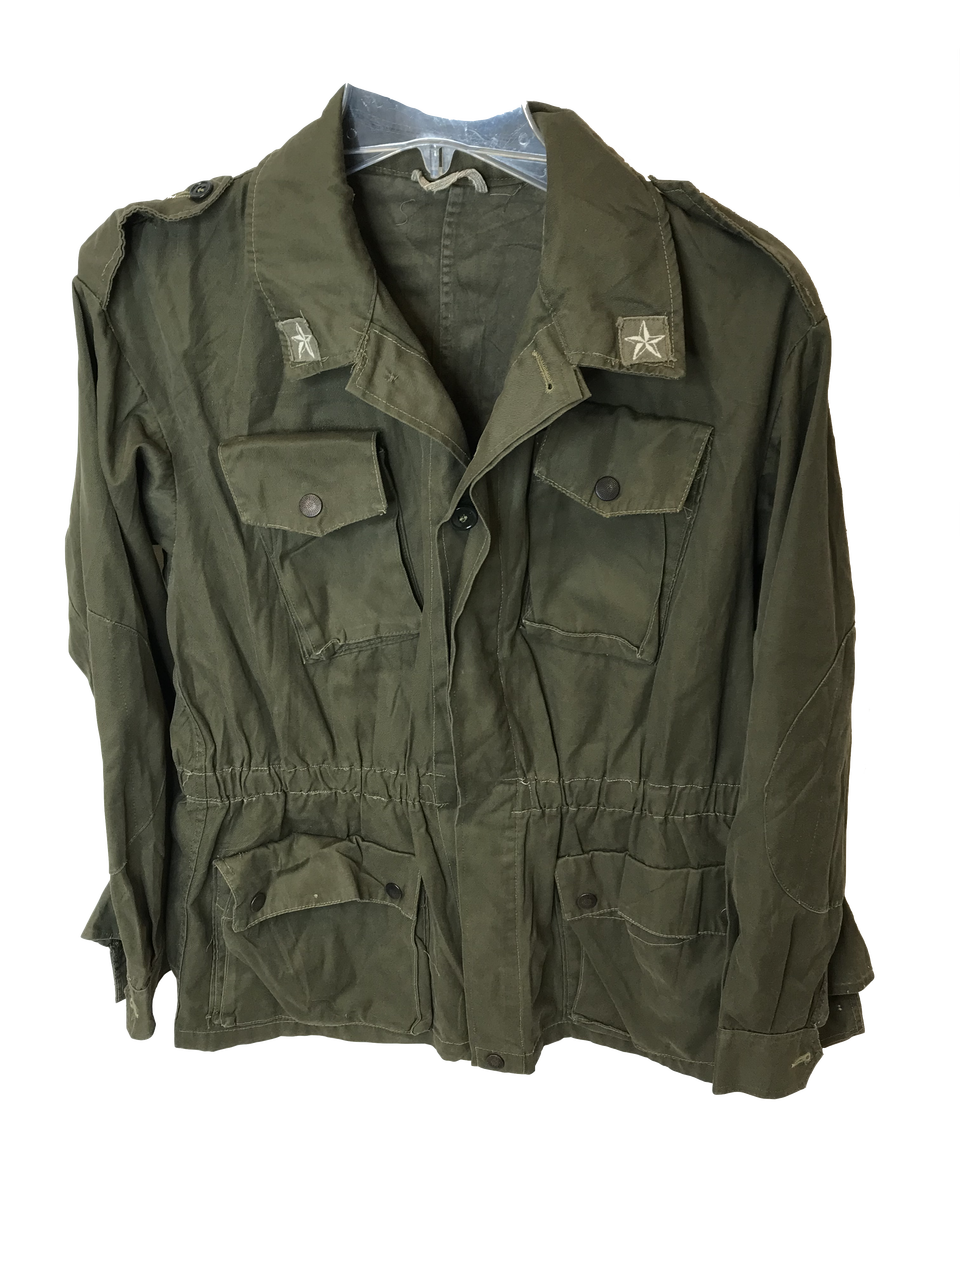 Vintage Italian Army Field Jacket - Army Surplus Warehouse 26cab57fb